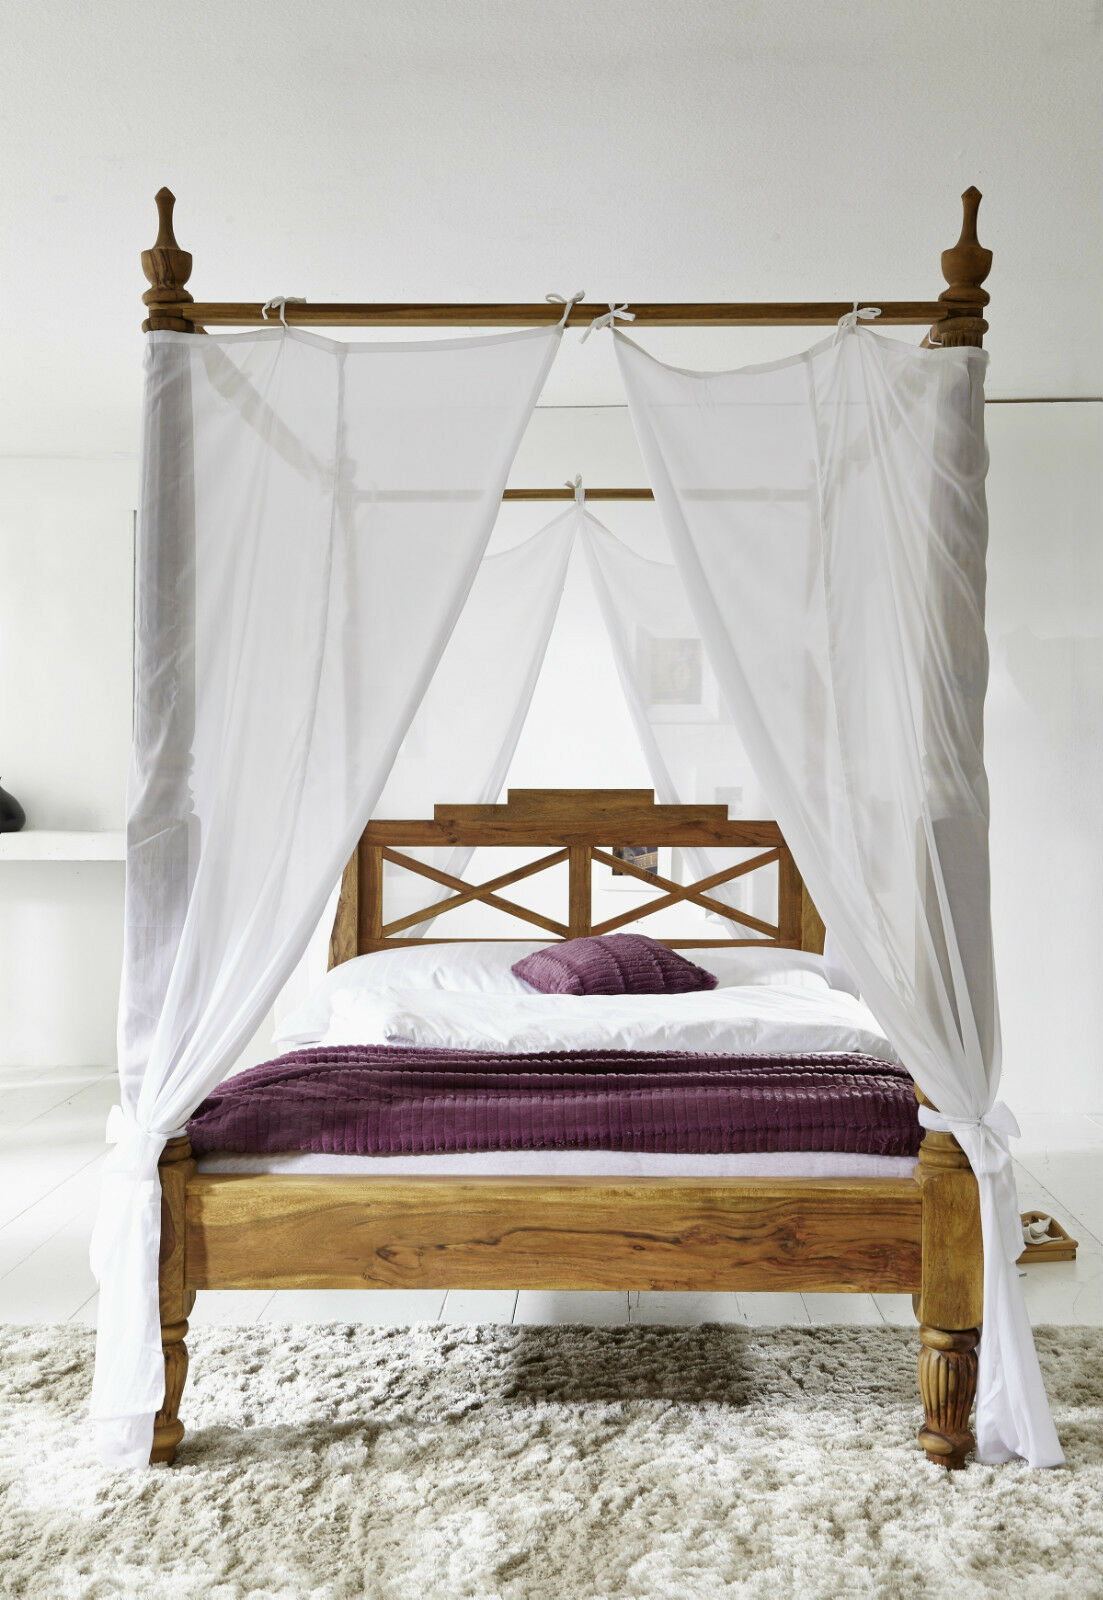 traumhaftes luxus himmelbett aus massiven palisander holz. Black Bedroom Furniture Sets. Home Design Ideas